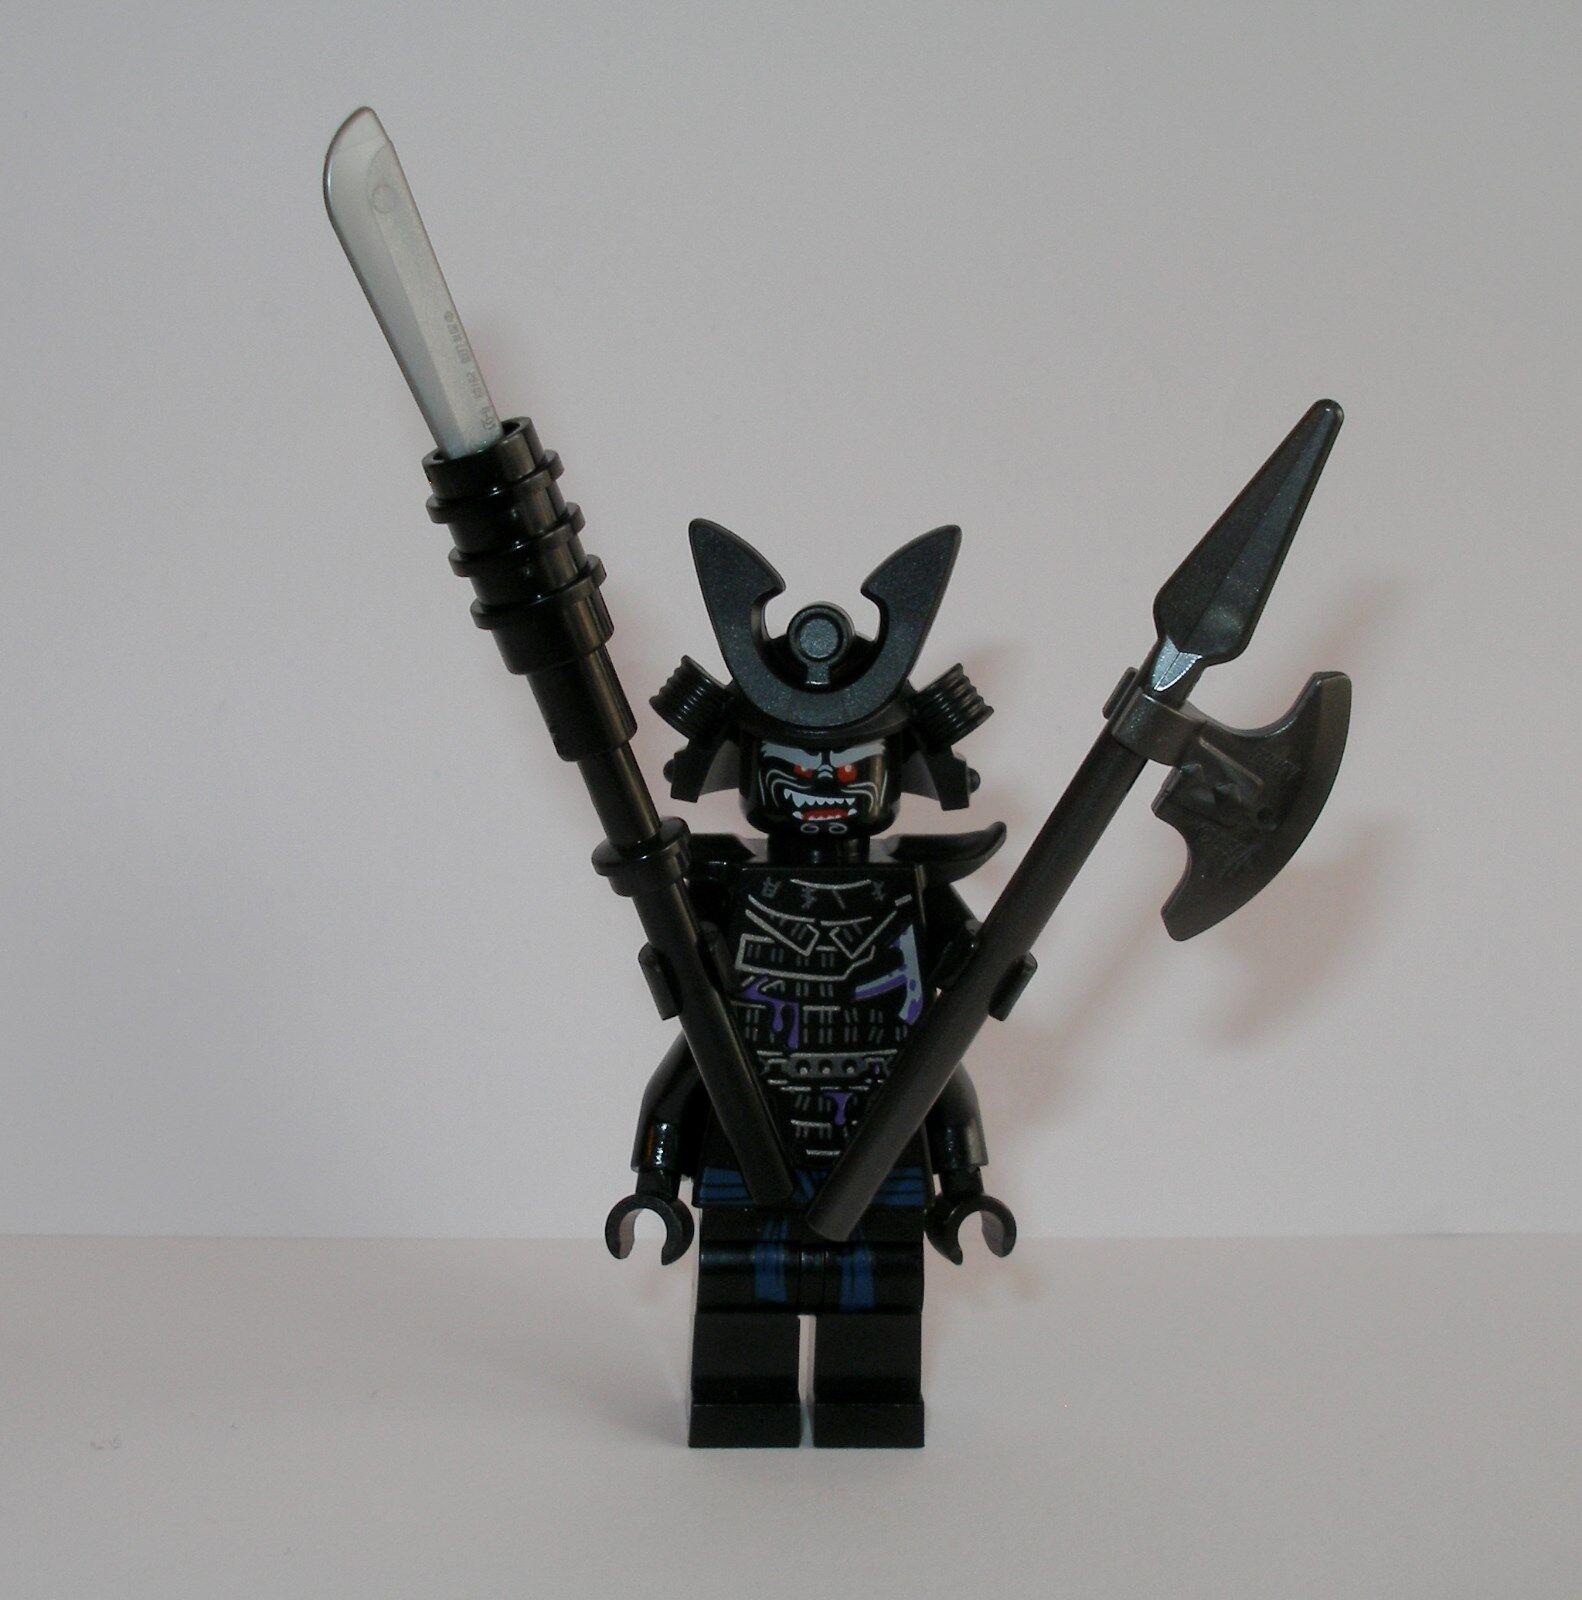 Lego ninjago garmadon bild - lord garmadon ninjago mit waffen ...